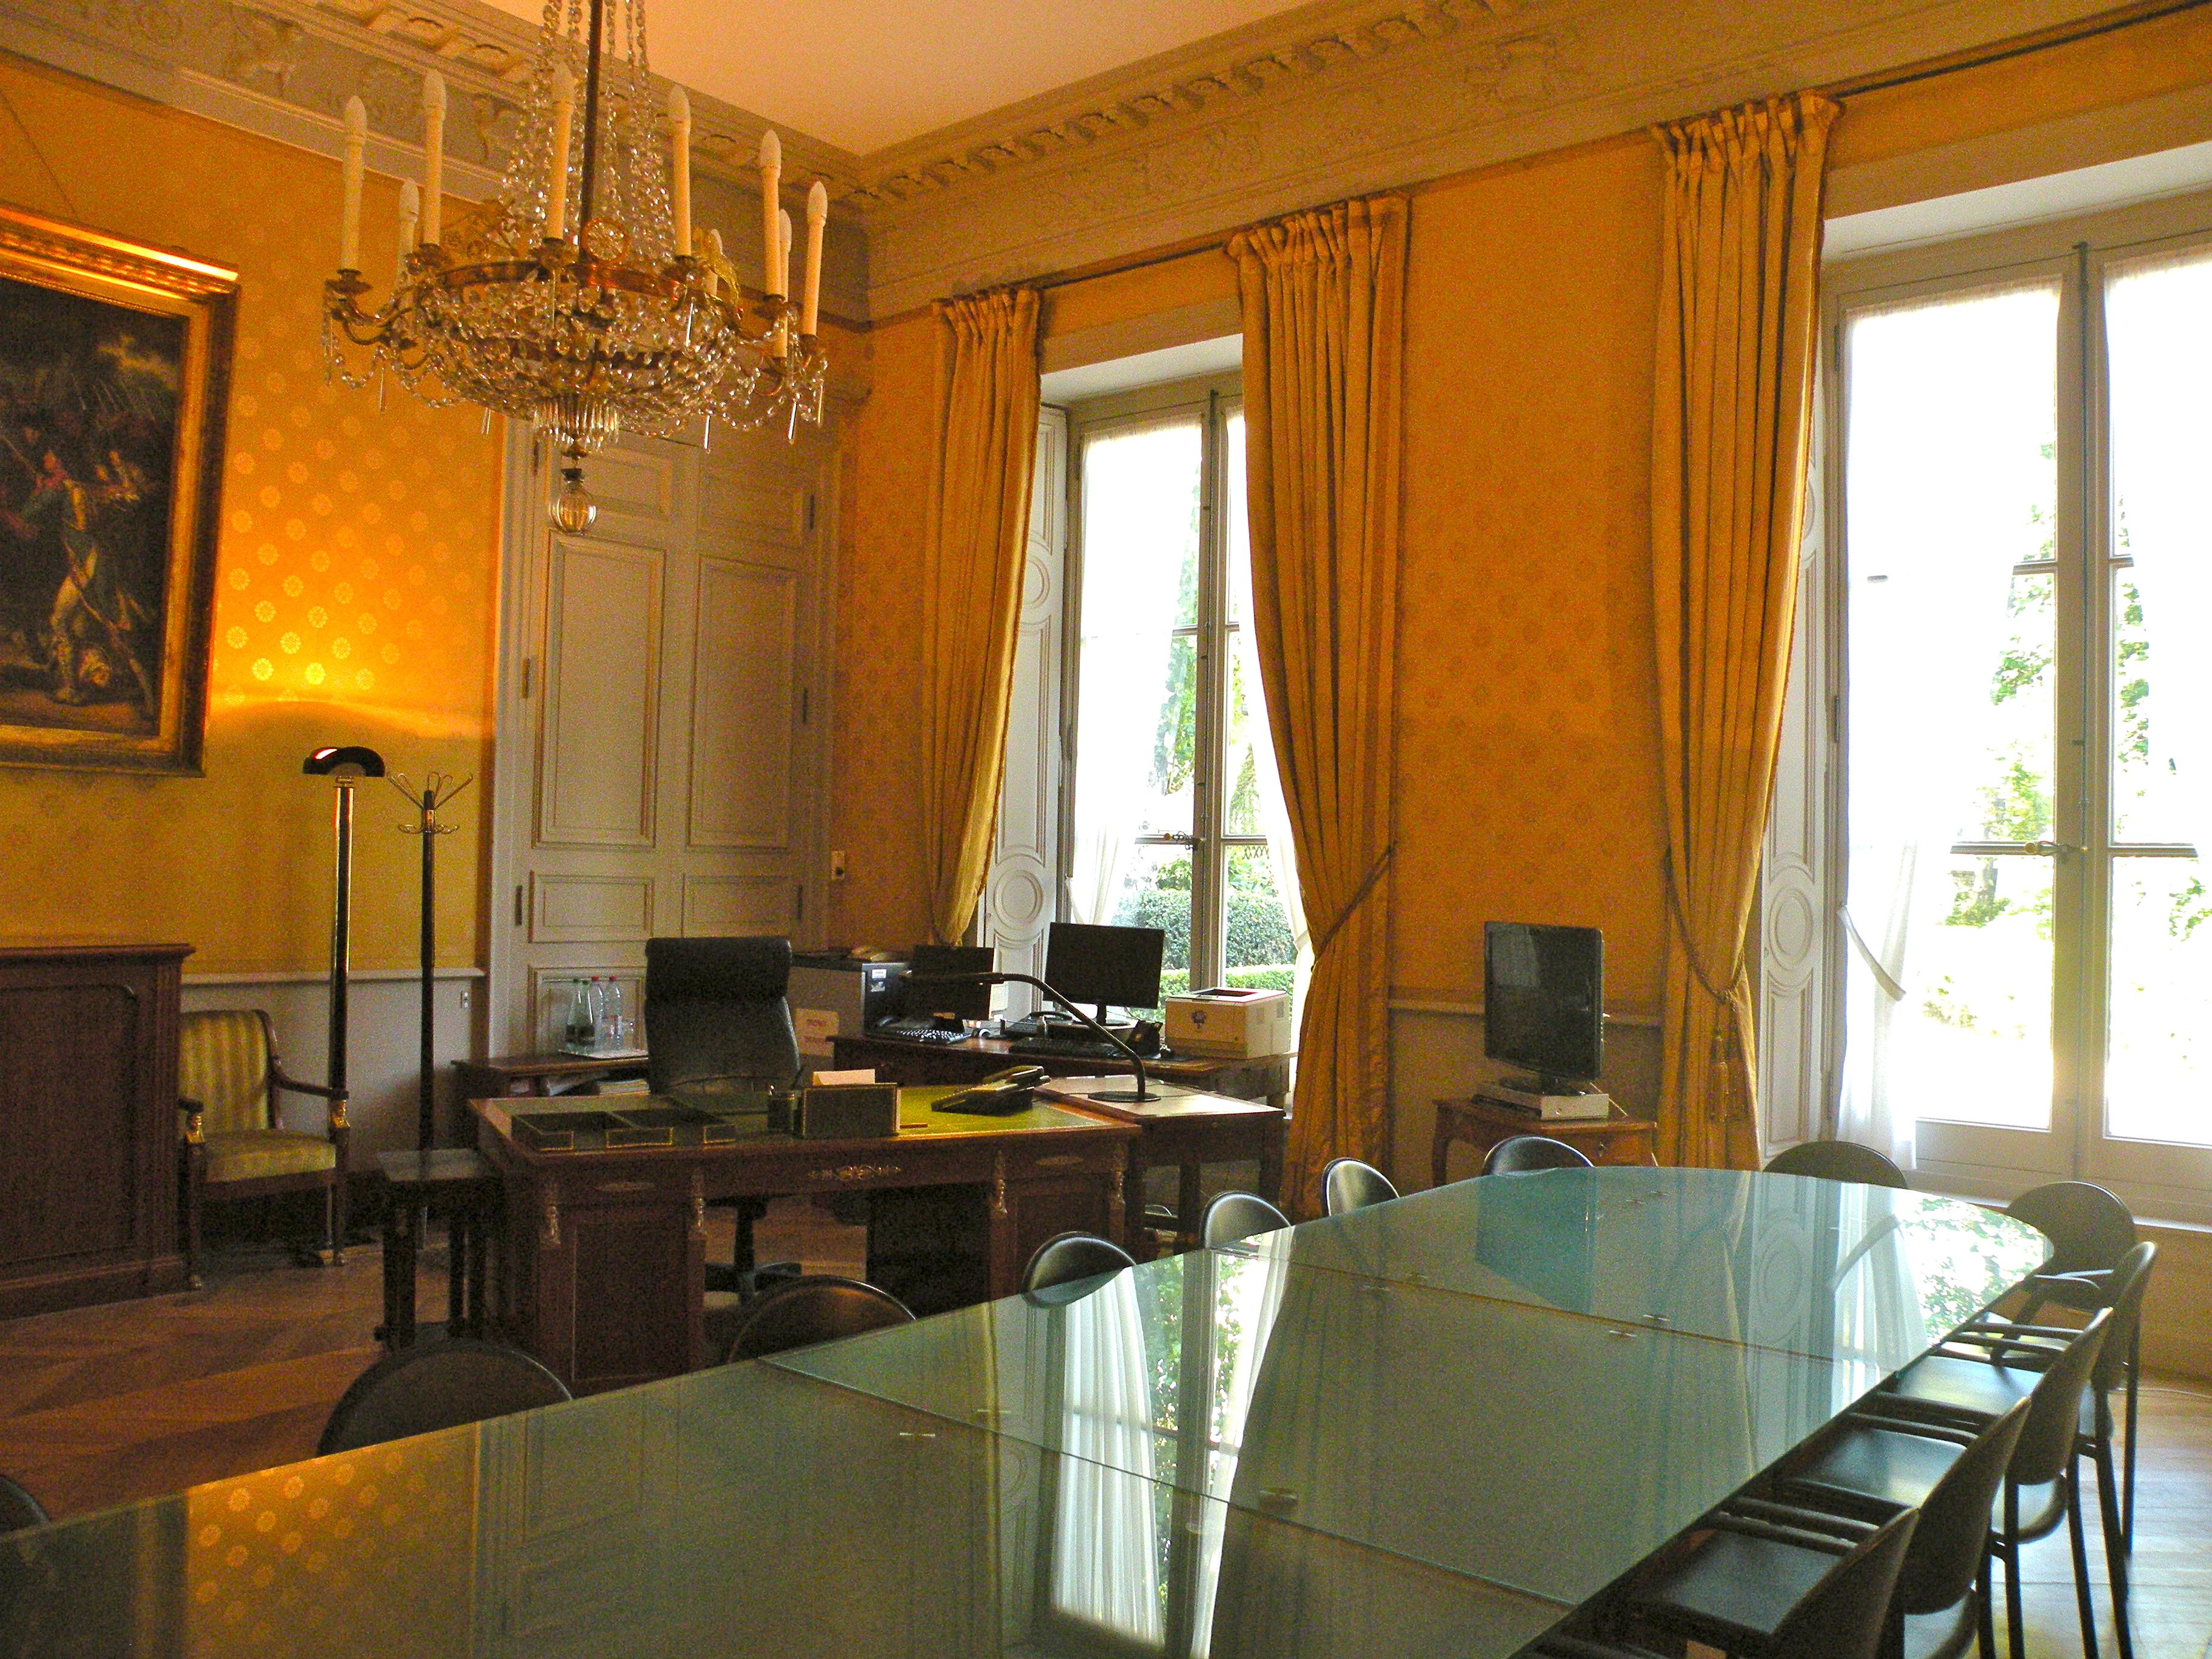 FileBrienne bureau directeur cabinet adjoint 1JPG Wikimedia